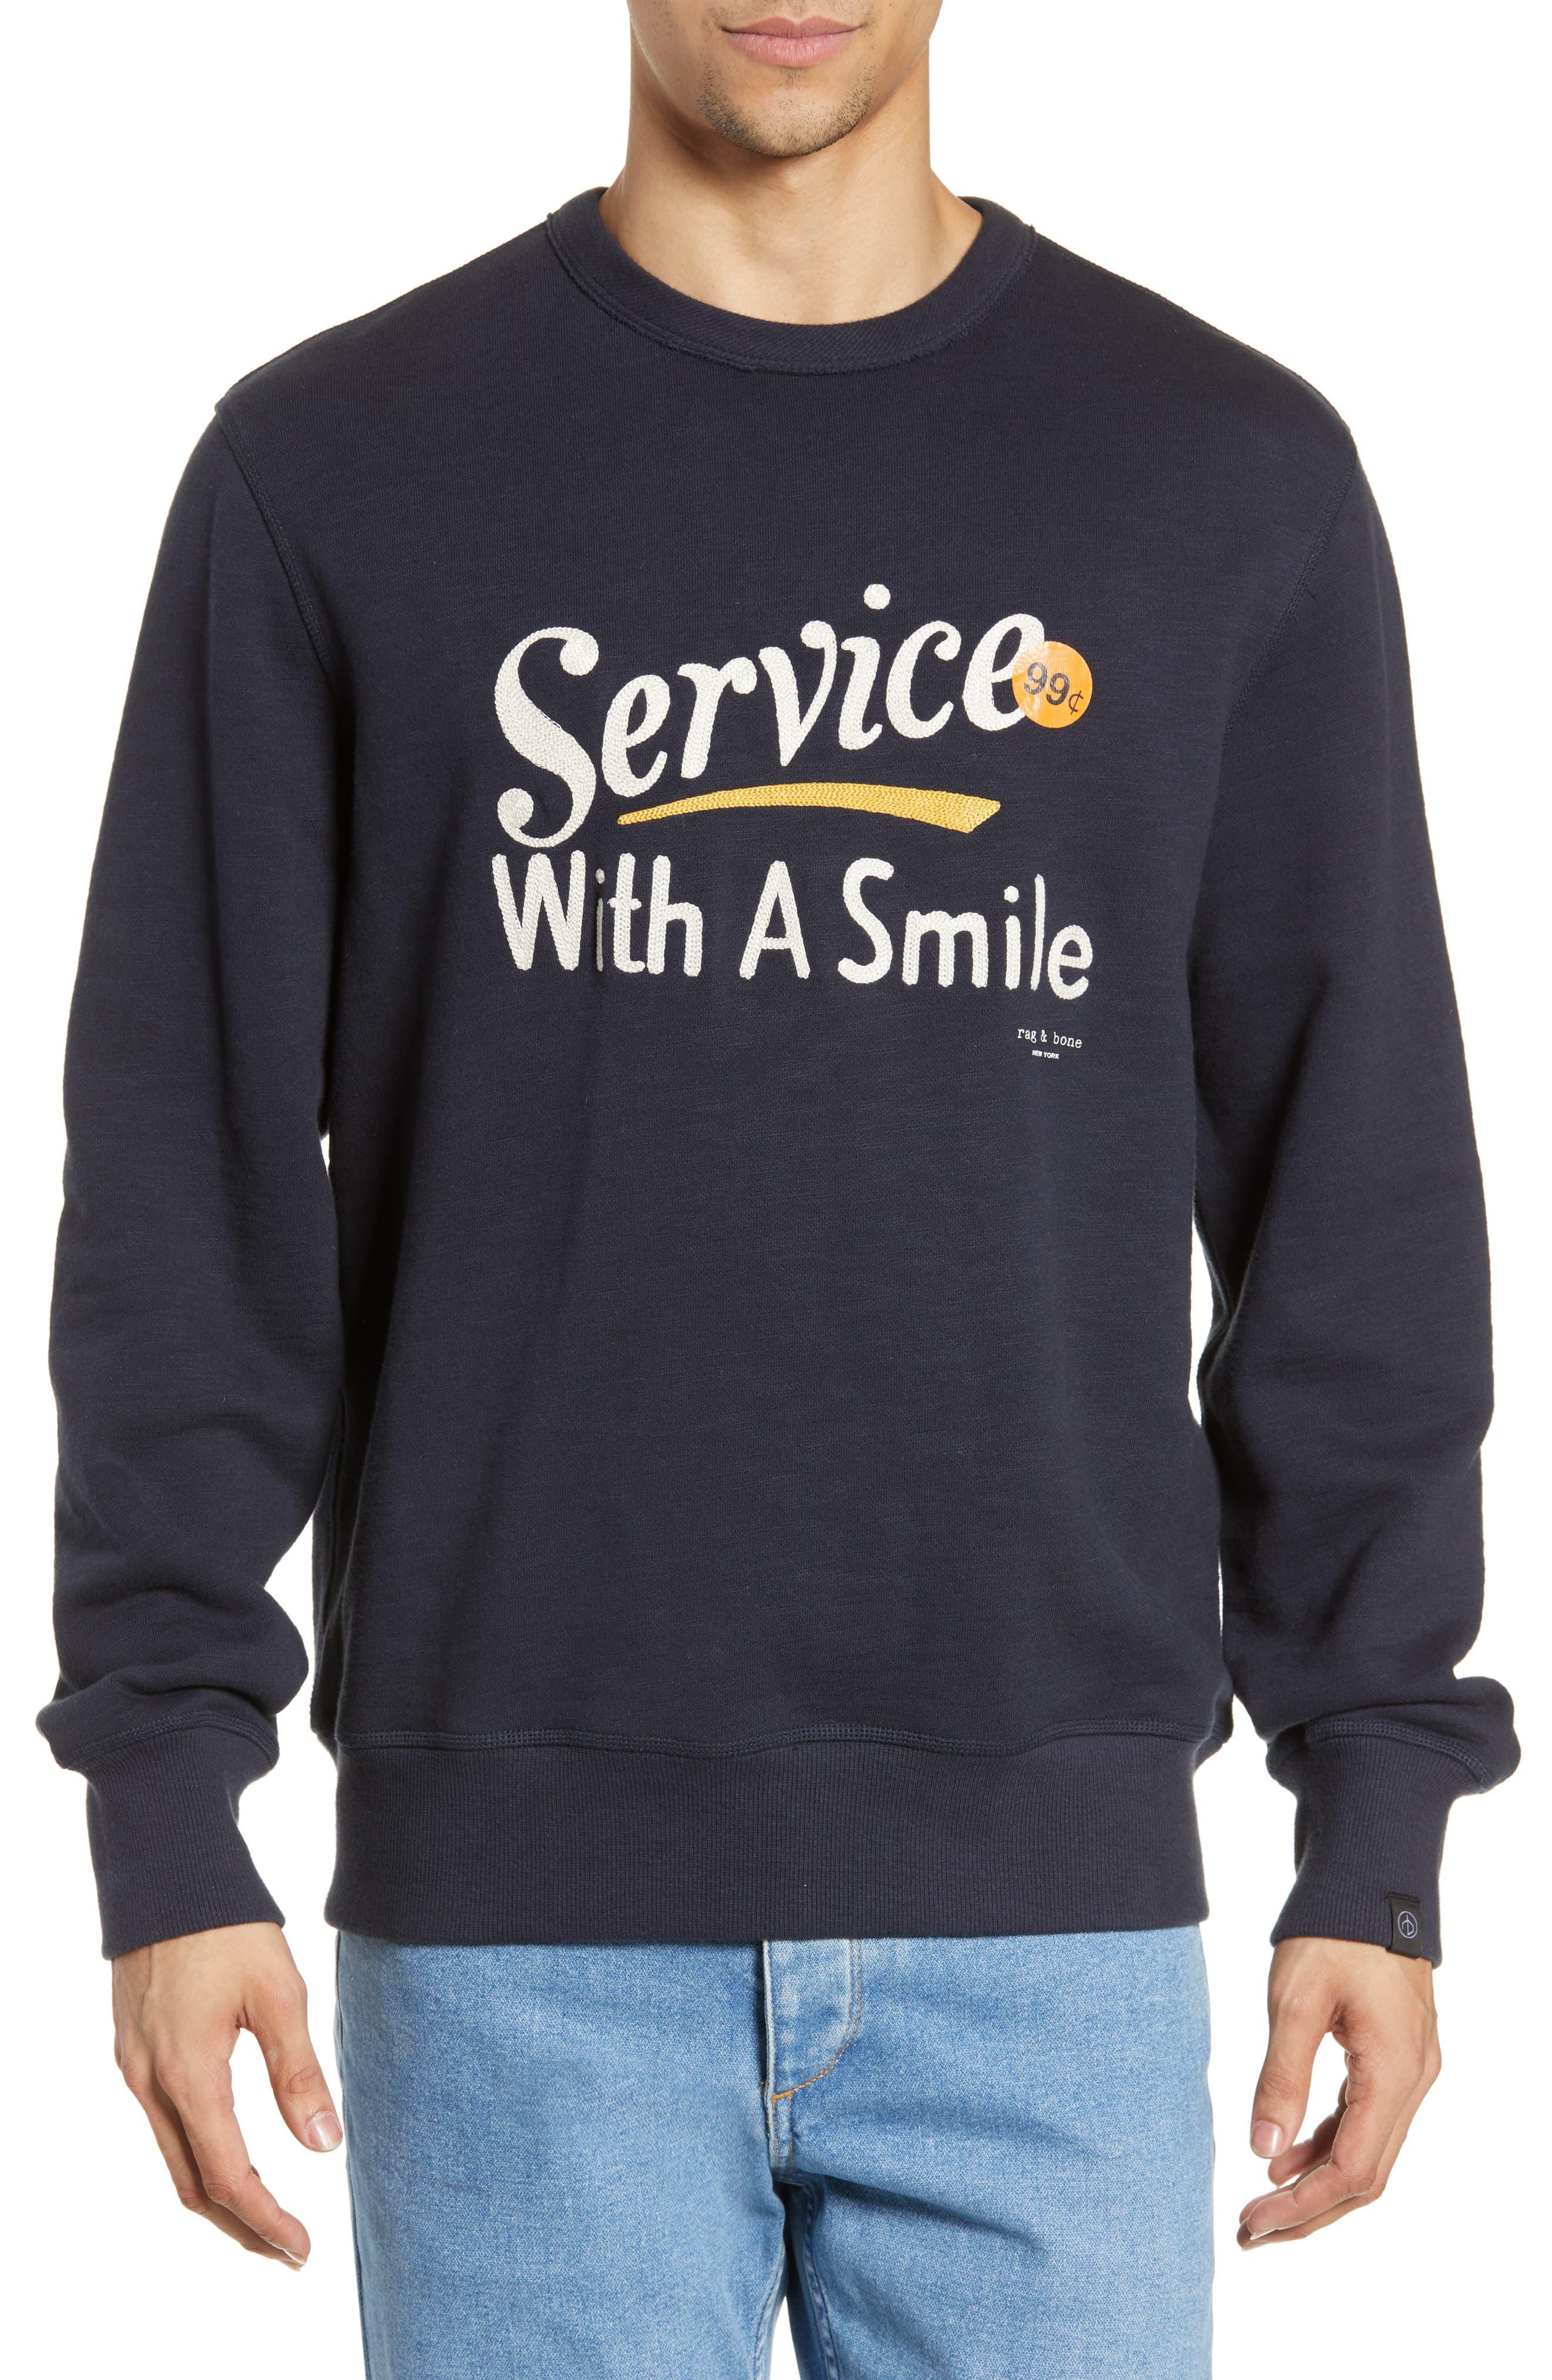 RAG & BONE, Graphic Embroidered Sweatshirt, Main thumbnail 1, color, NAVY